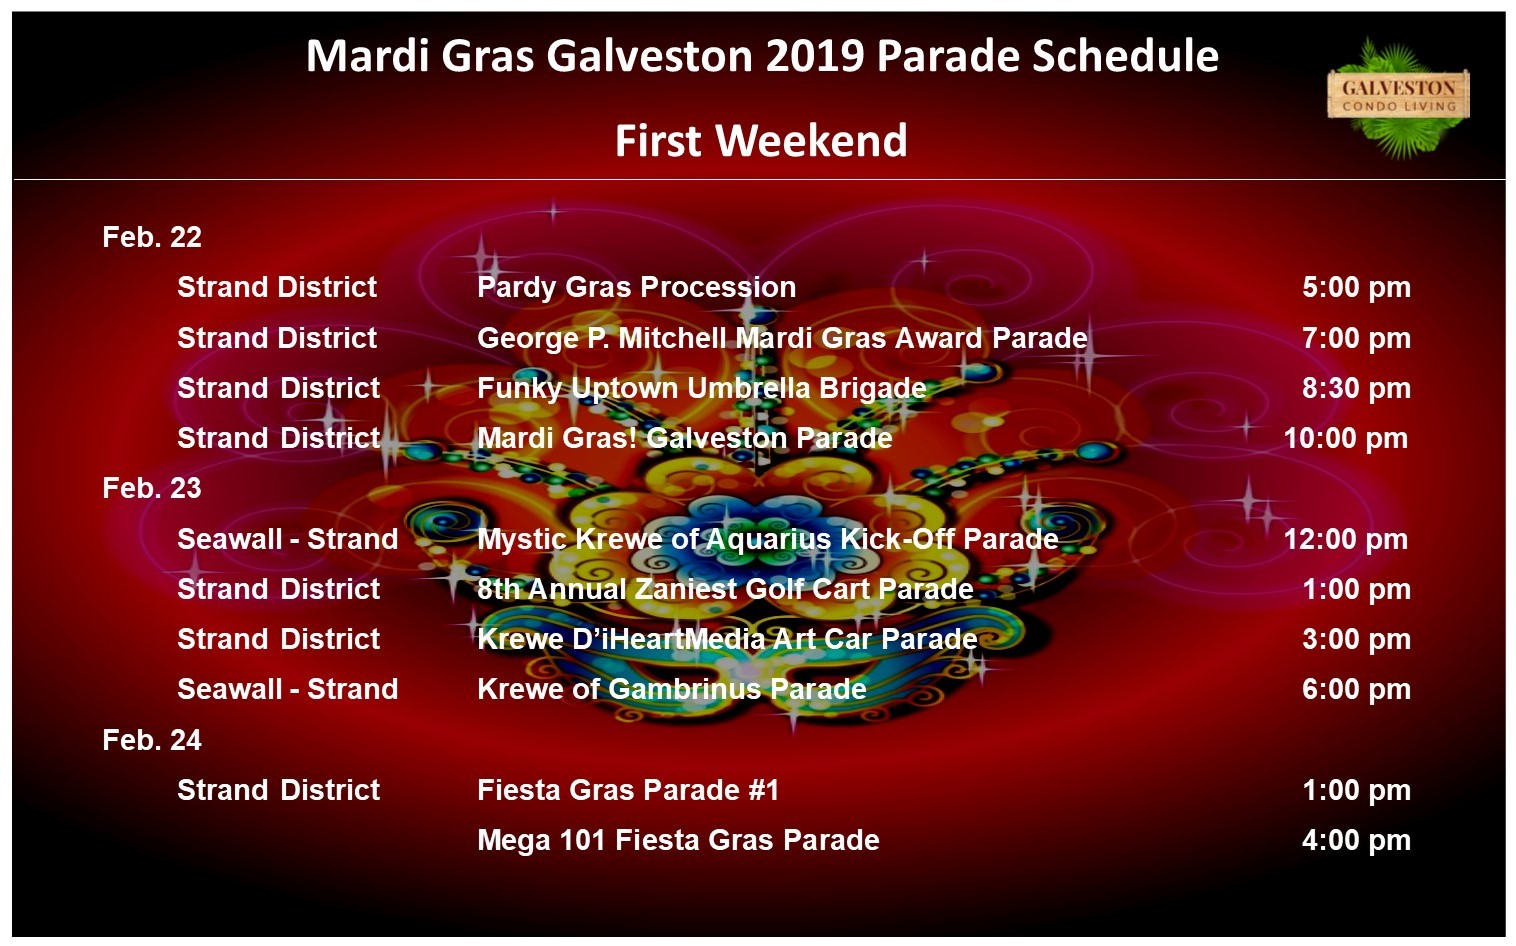 Mardi Gras First Weekend